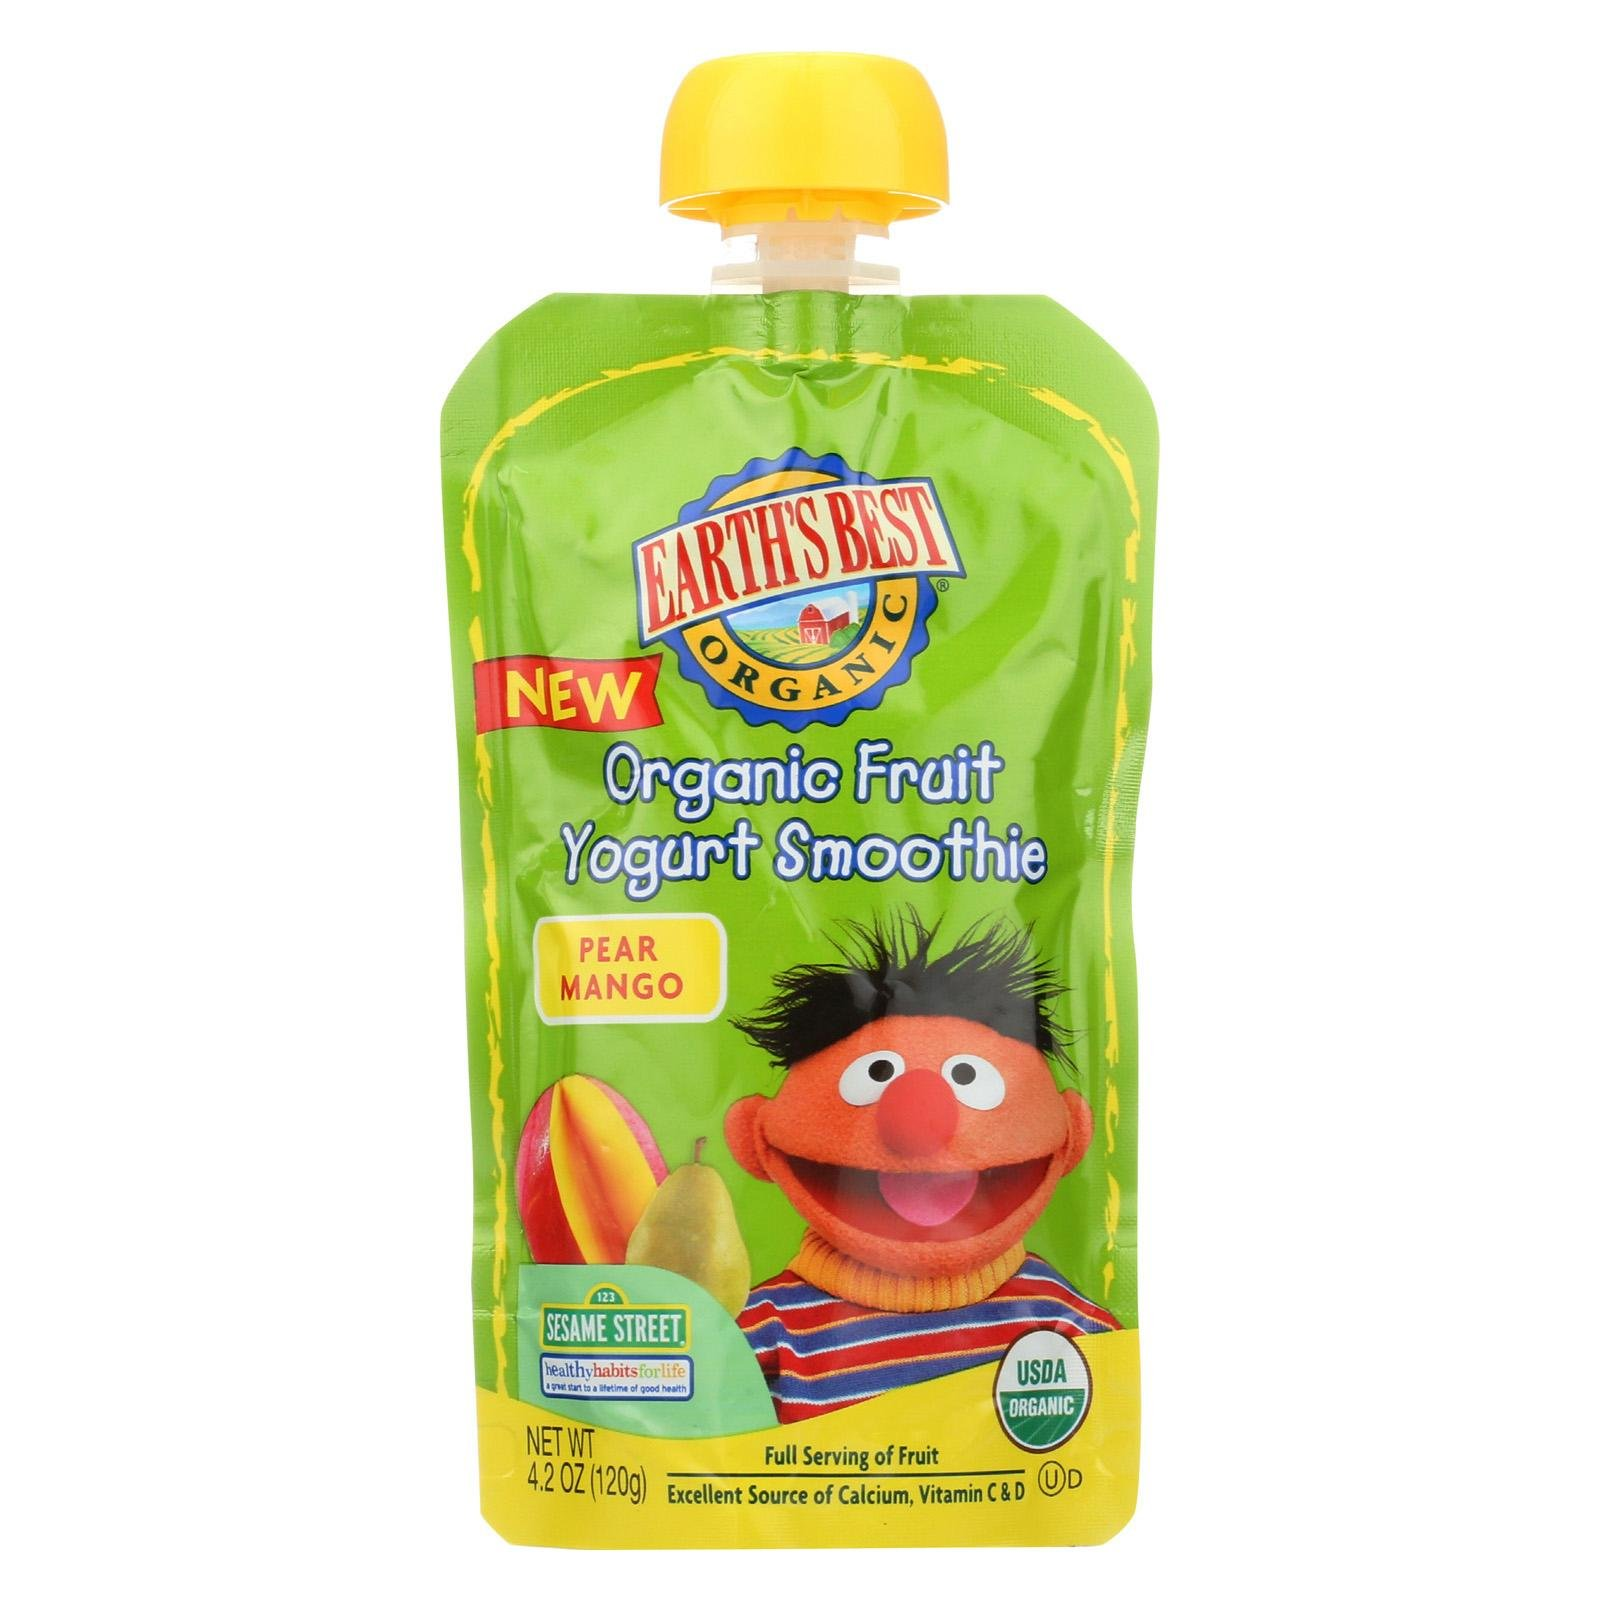 Earth's Best Fruit Yogurt Smoothie, Pear Mango, 4.22 oz